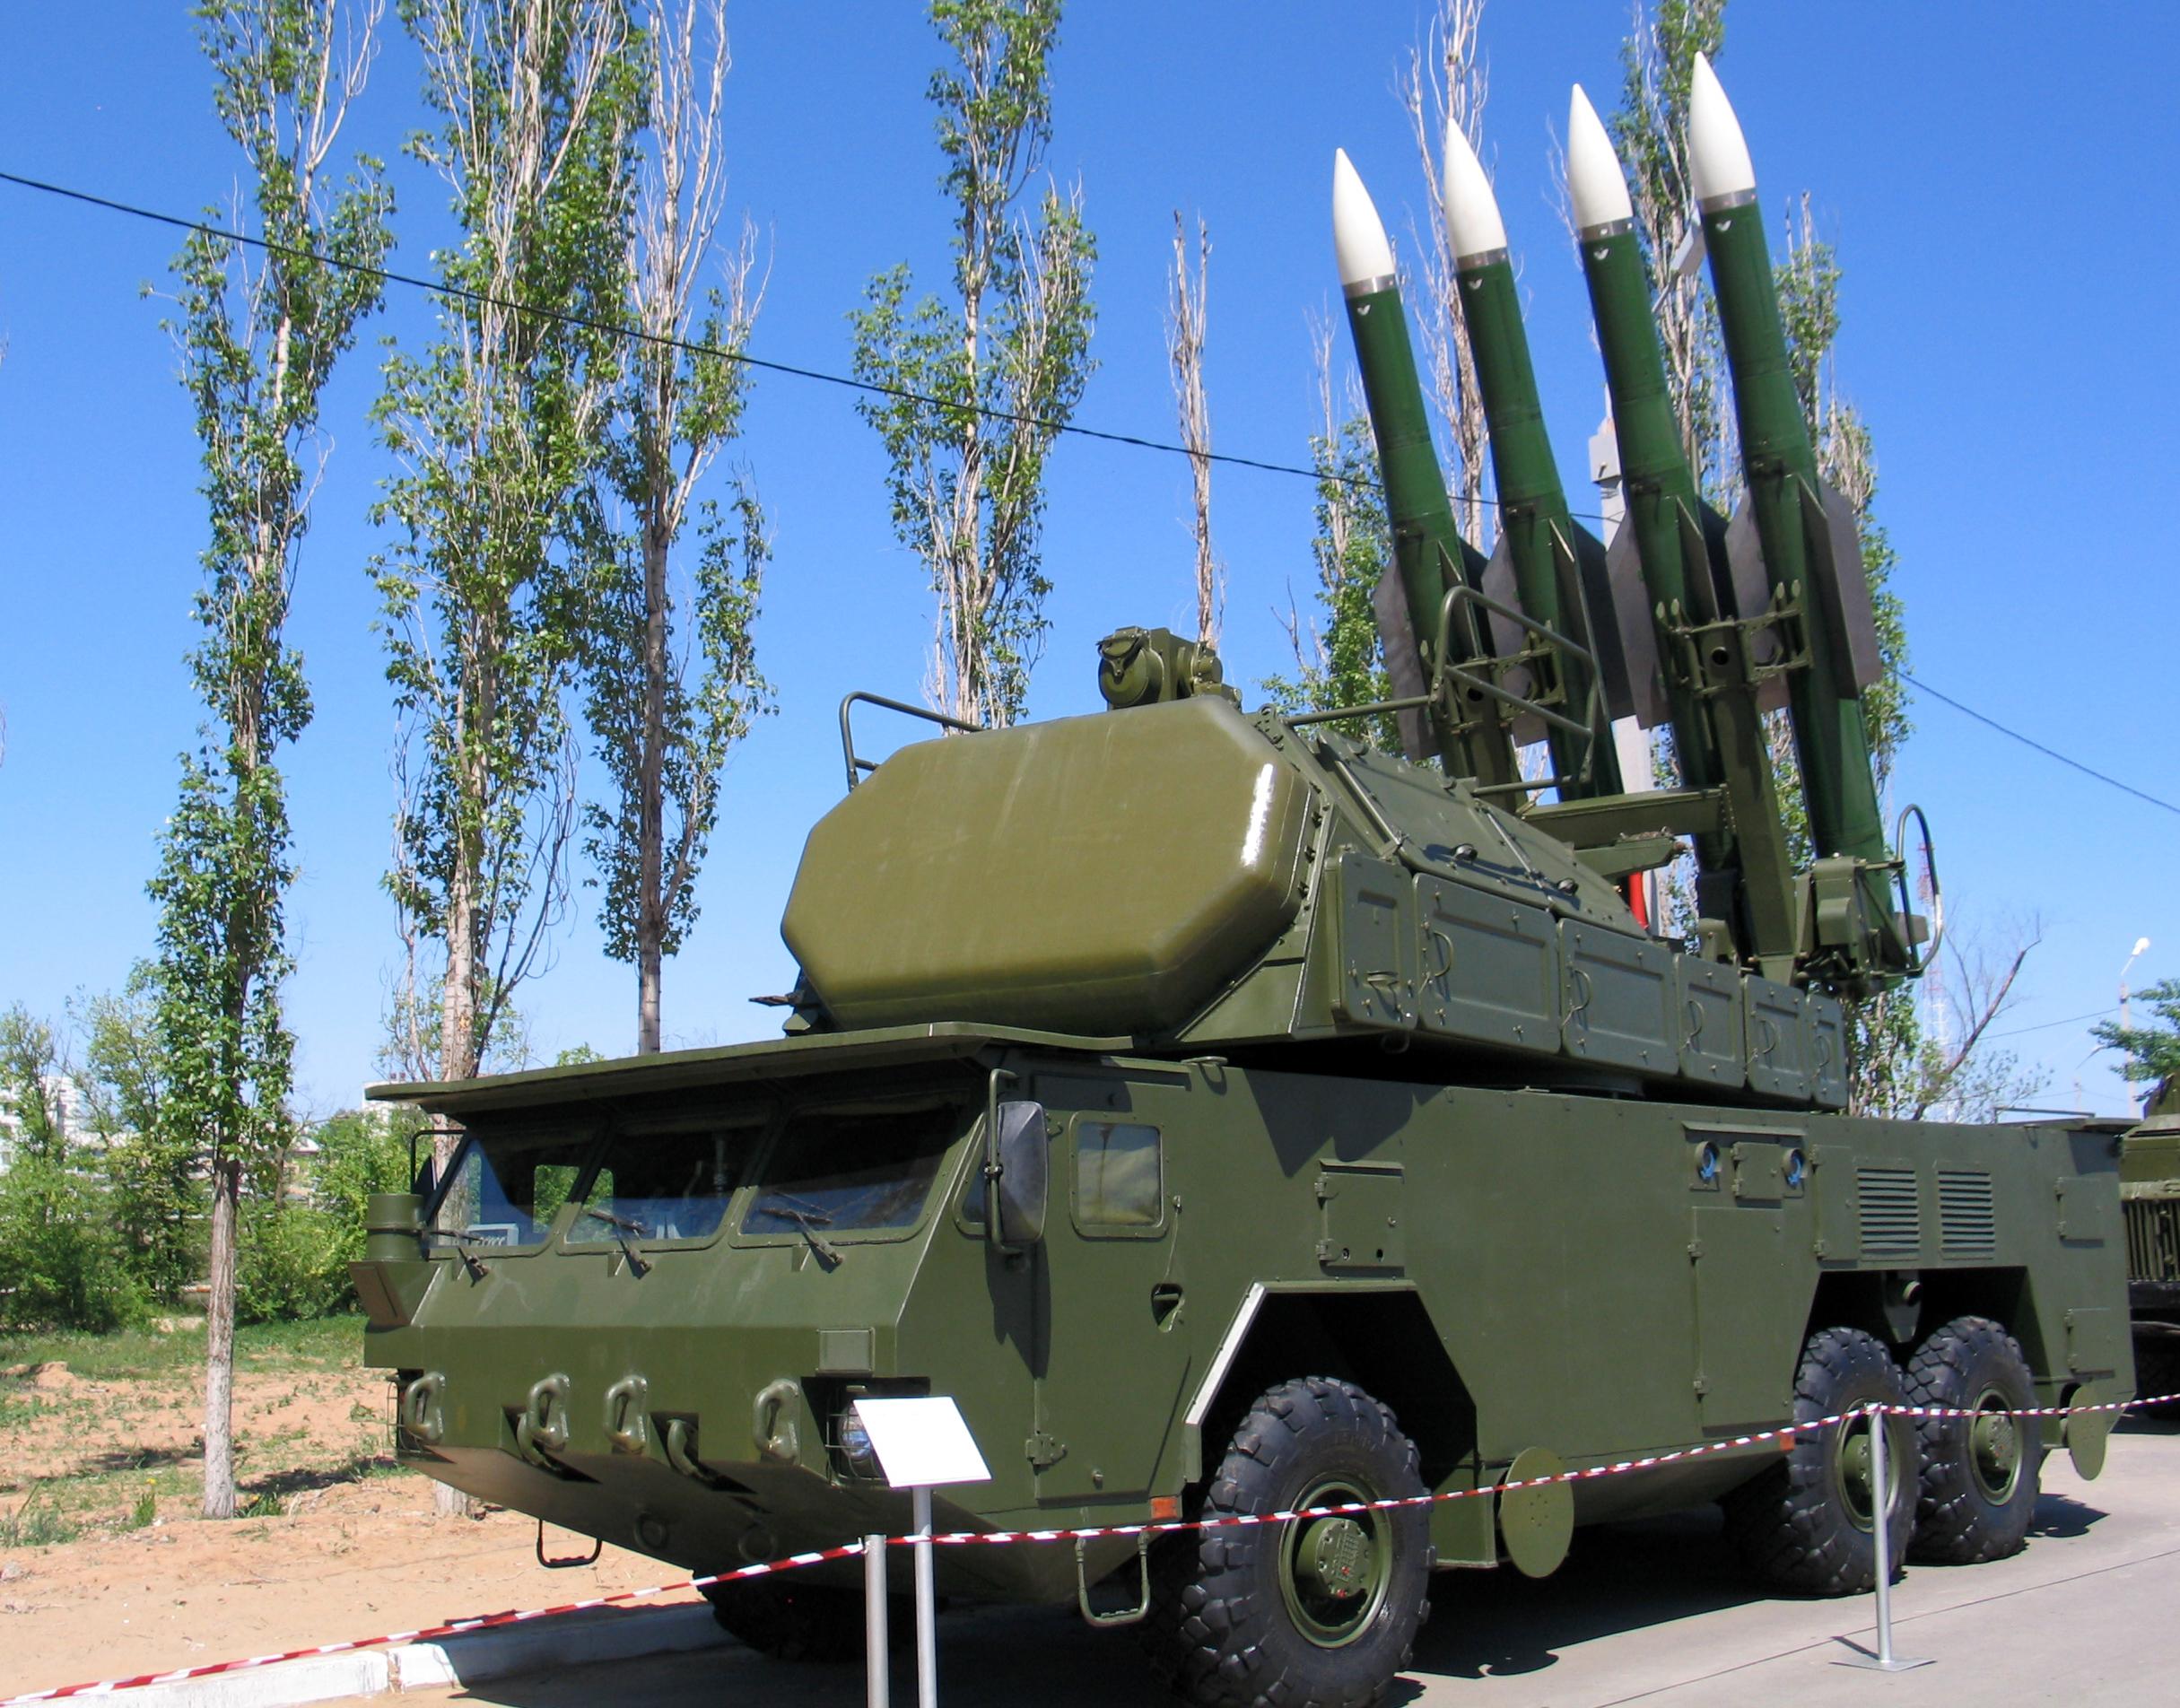 Rudal BUK 9K37 Rusia SA-11 Gadfly 1